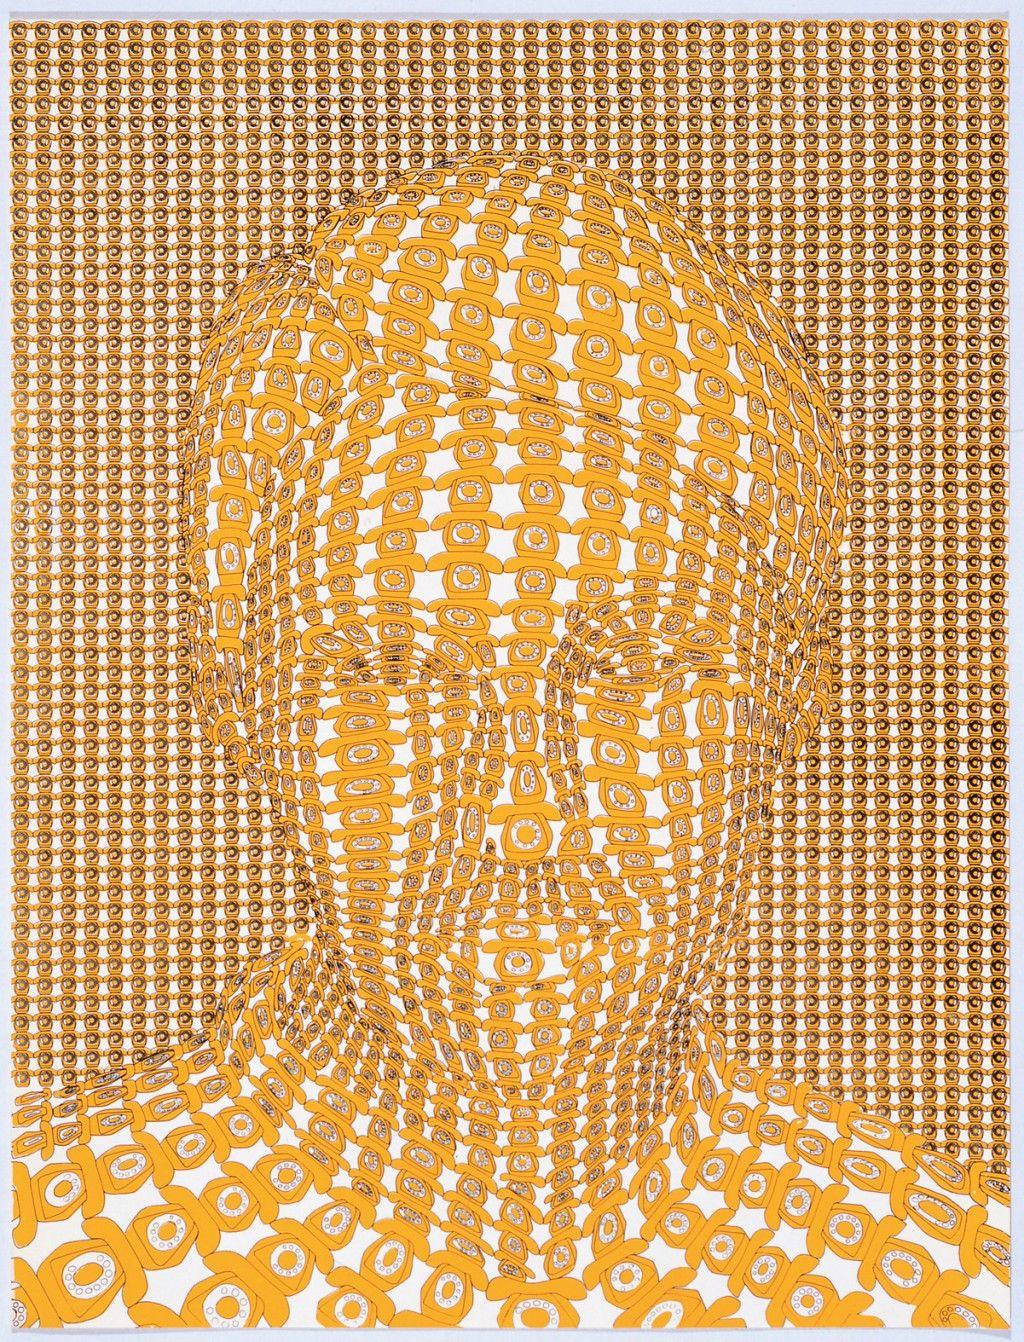 Thomas Bayrle  telefon portrait